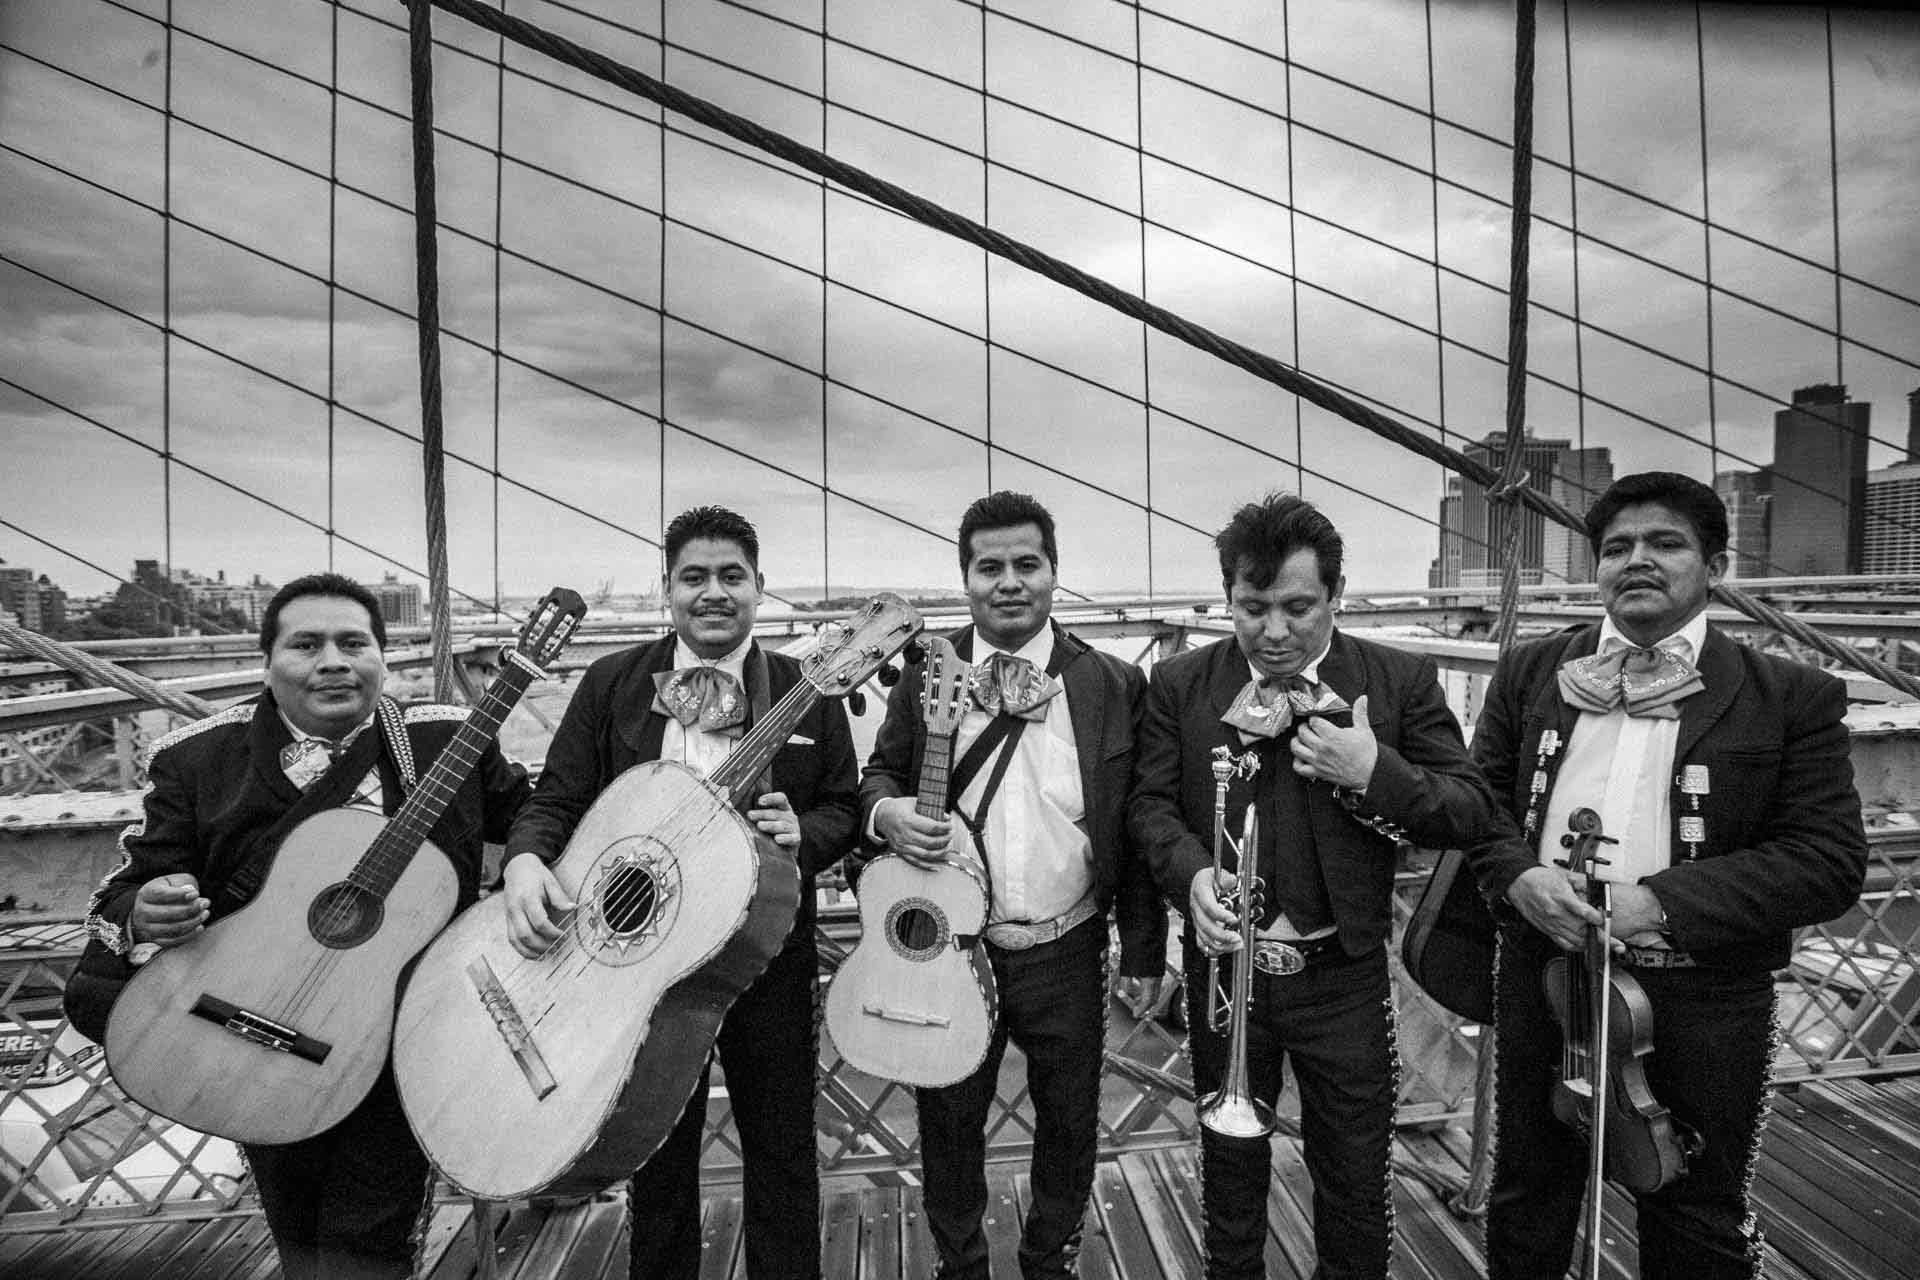 @Ken Shung - New York Rain, 2010 . Black and white - band standing on the bridge holding instruments